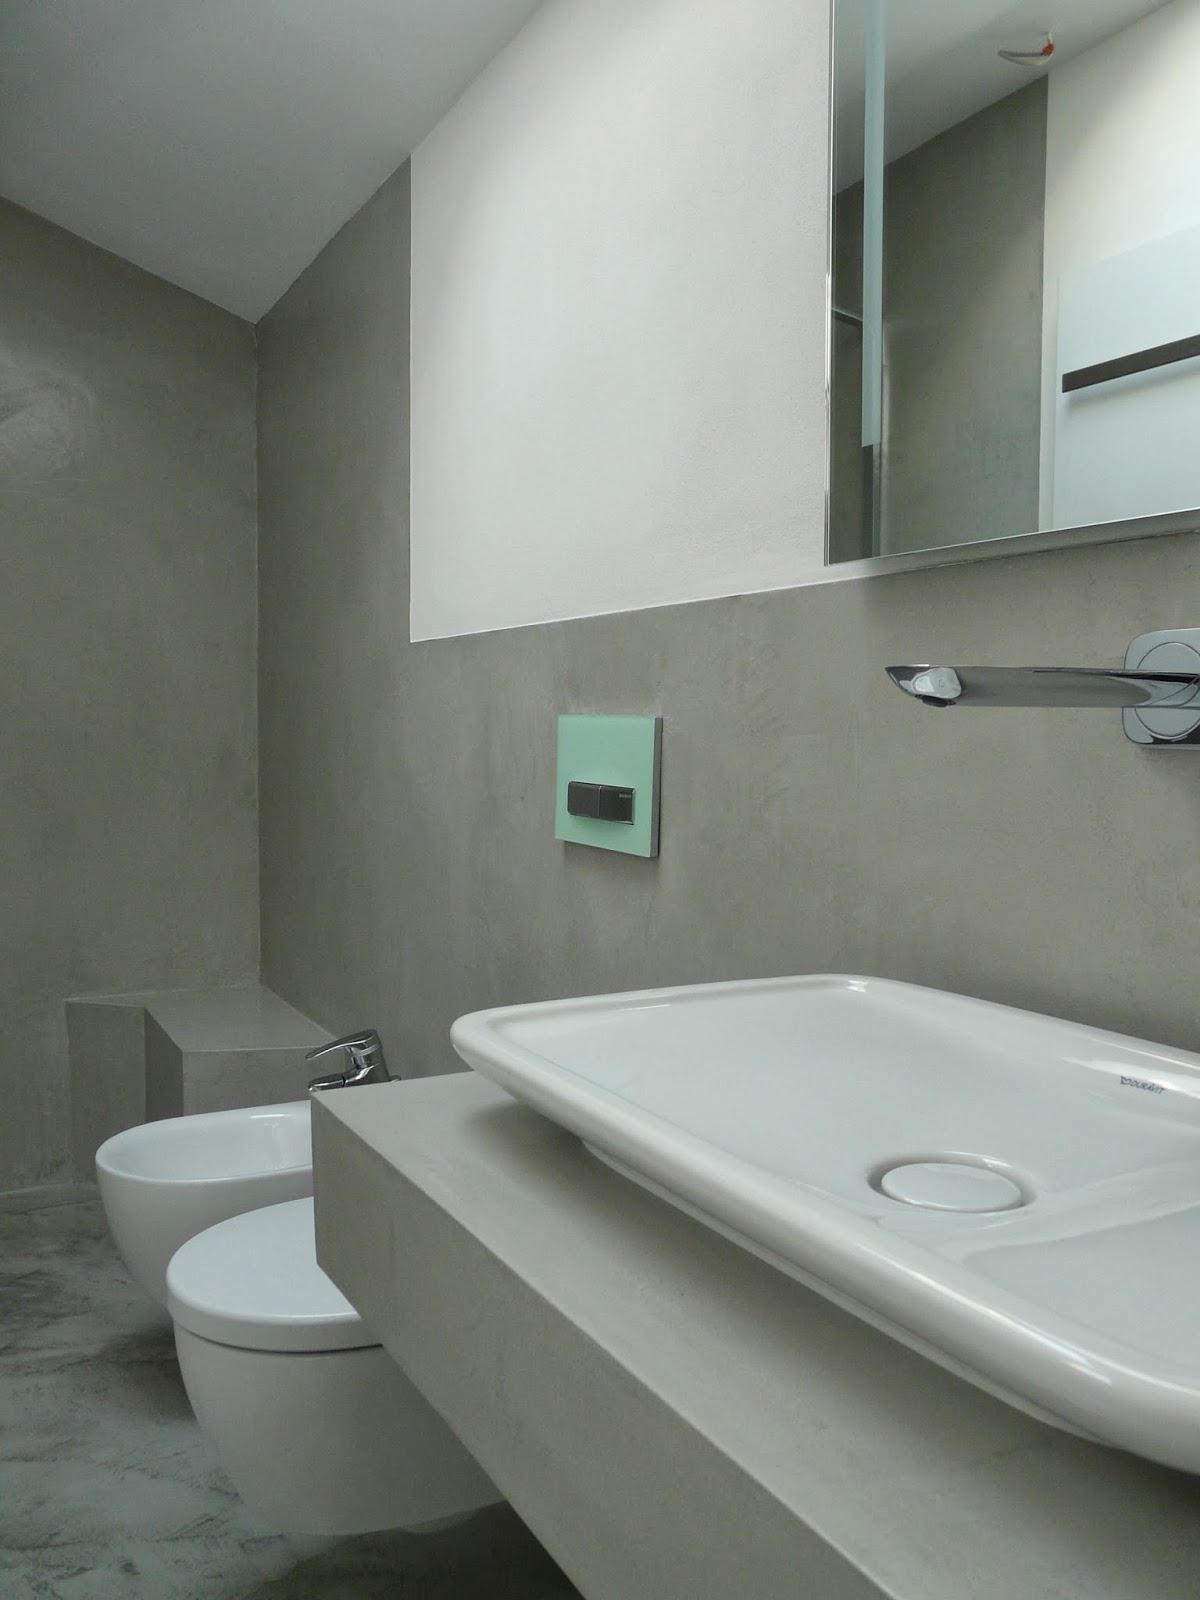 wand wohndesign beton cire oktober 2013. Black Bedroom Furniture Sets. Home Design Ideas